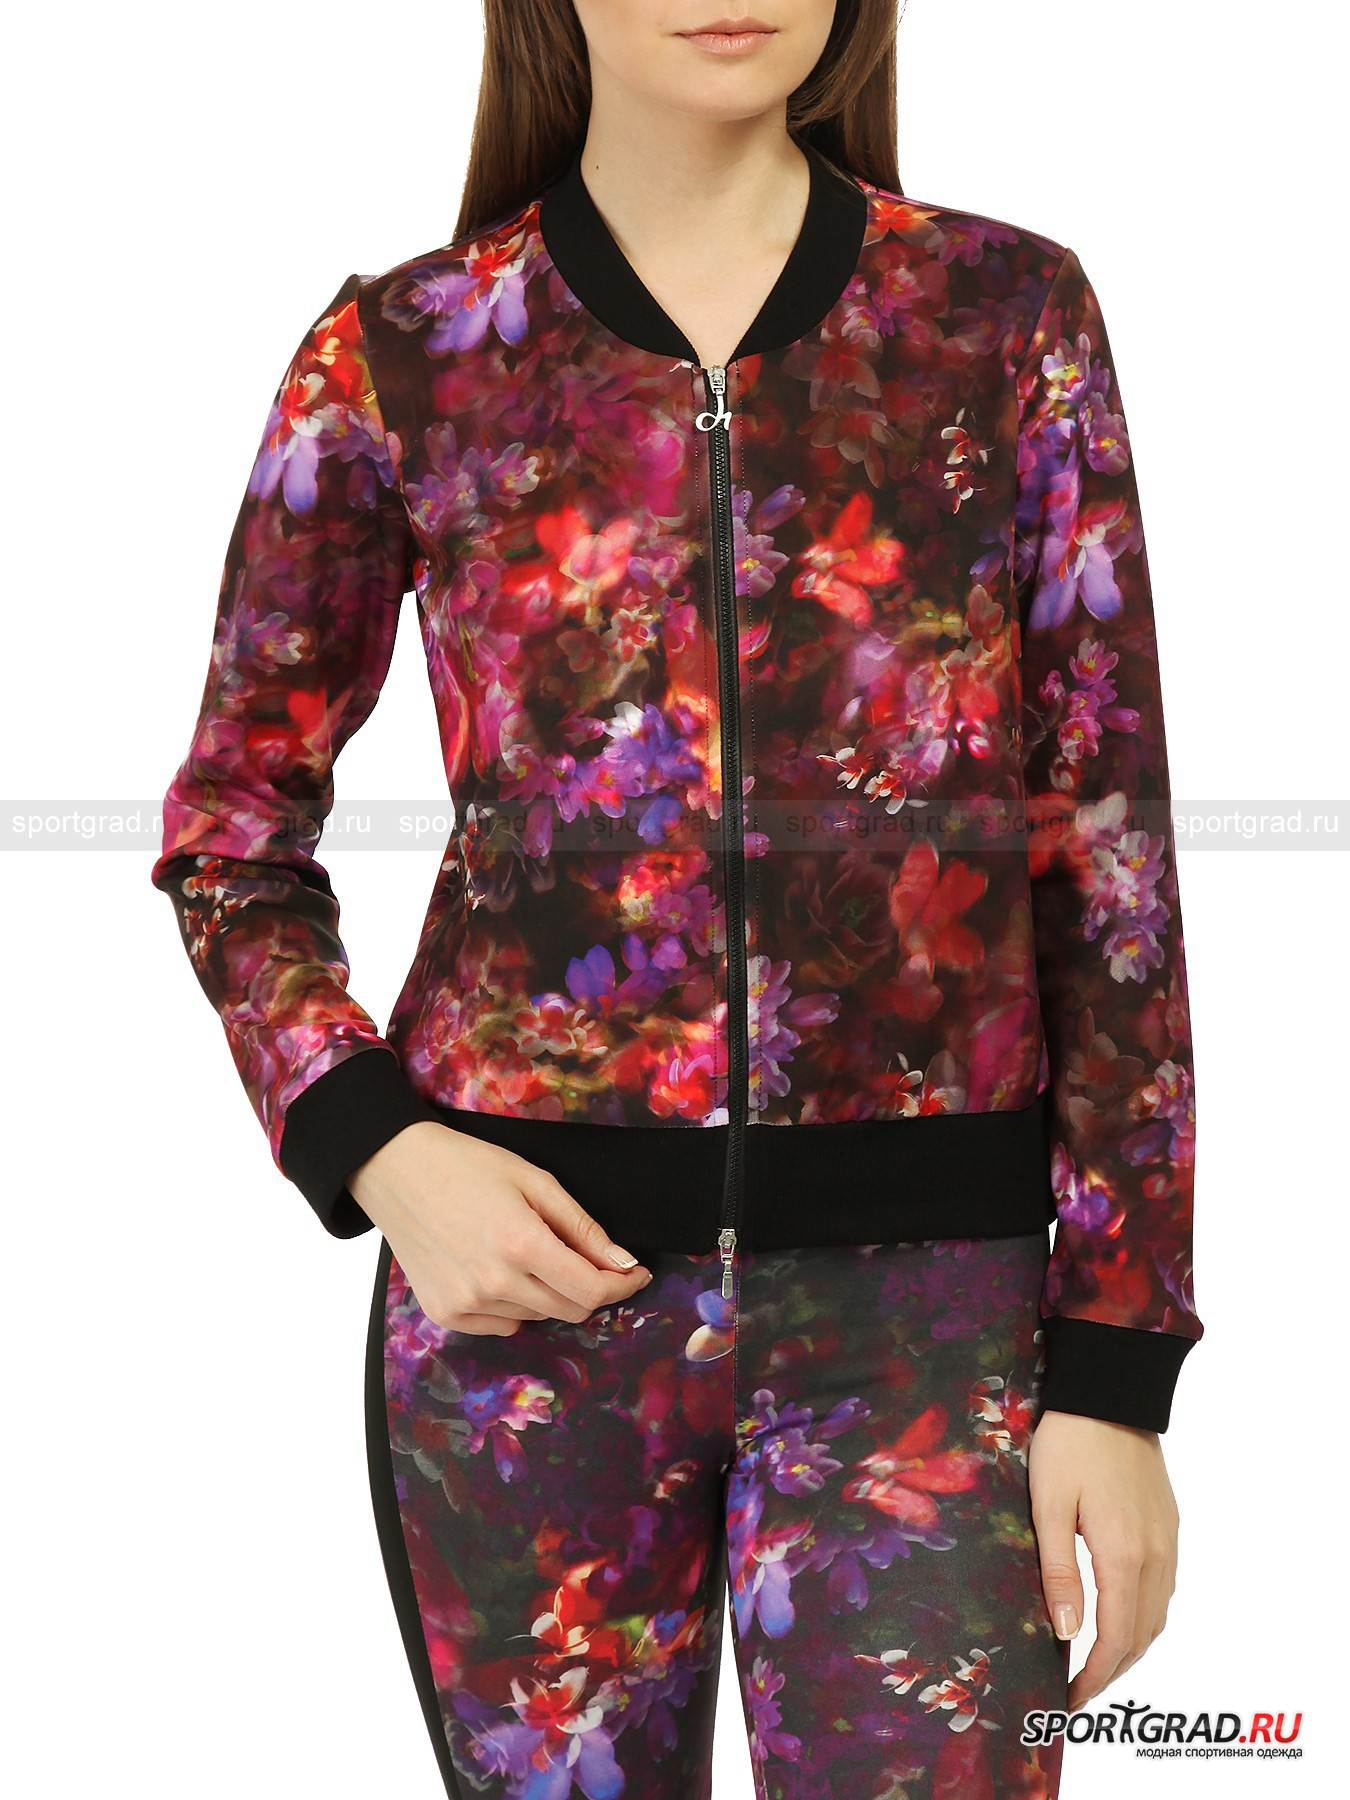 Толстовка женская Flowers Print Jacket DEHA от Спортград